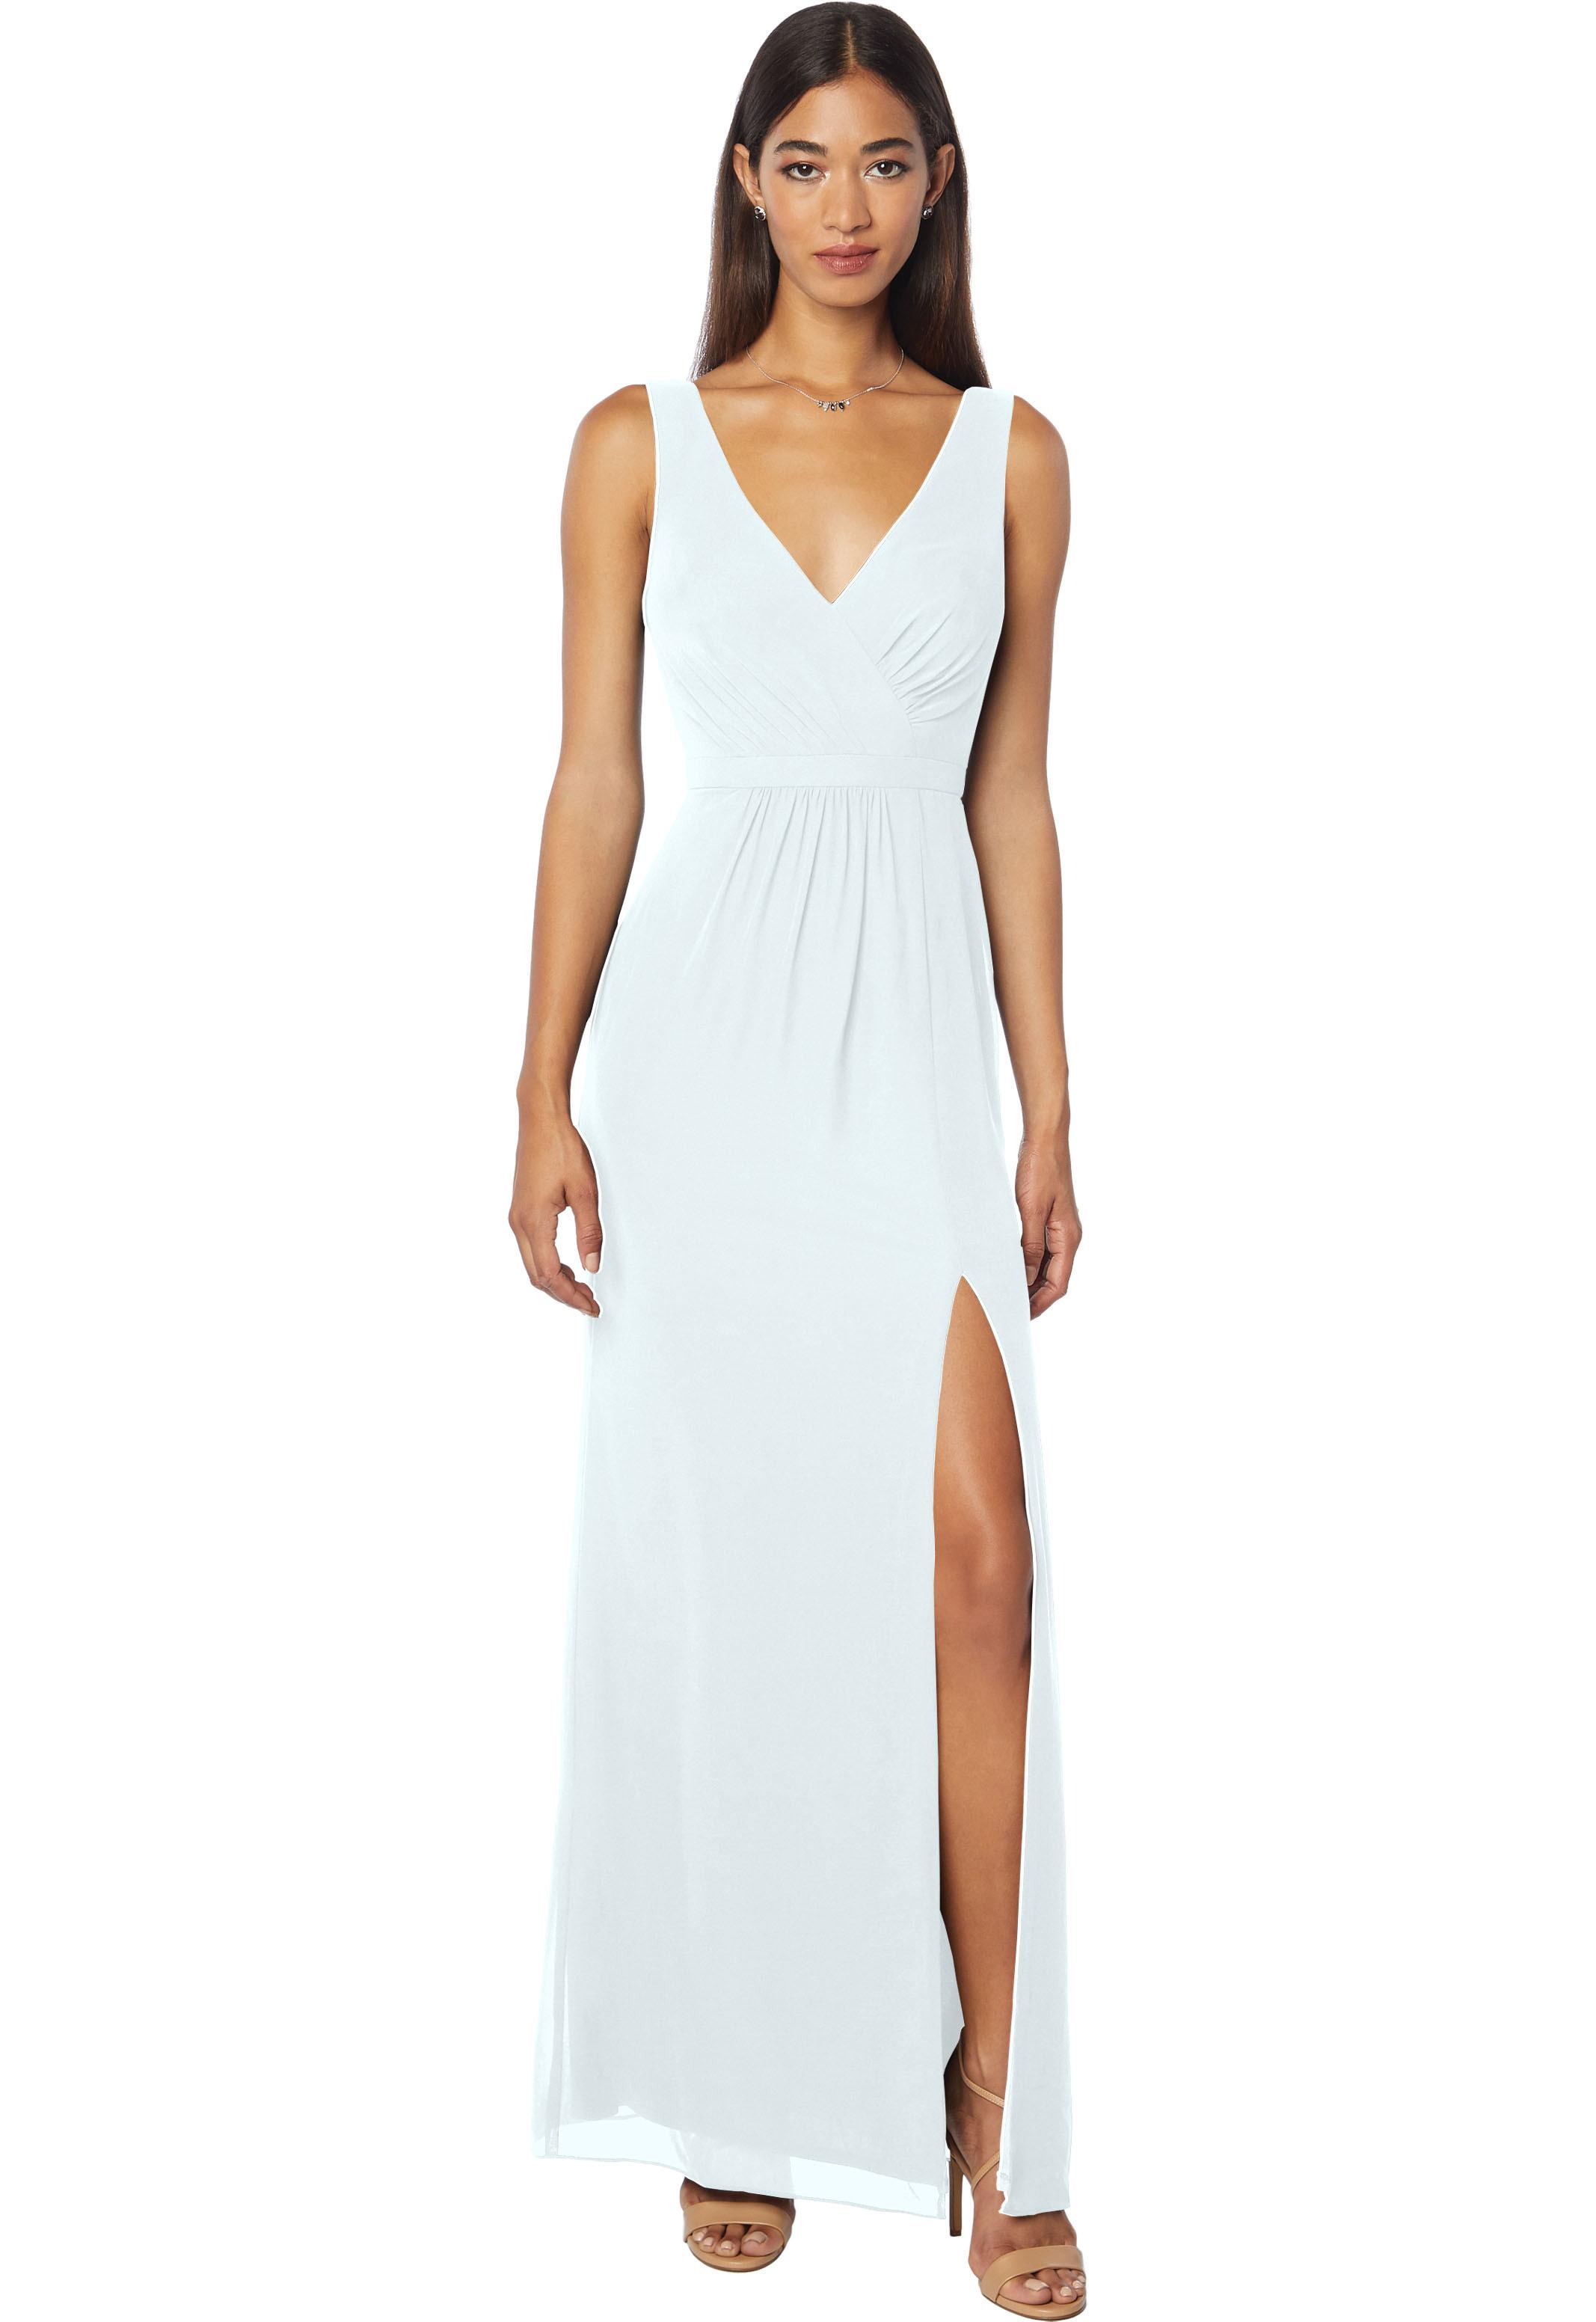 Bill Levkoff PALE BLUE Chiffon Sleeveless Natural Waist gown, $178.00 Front